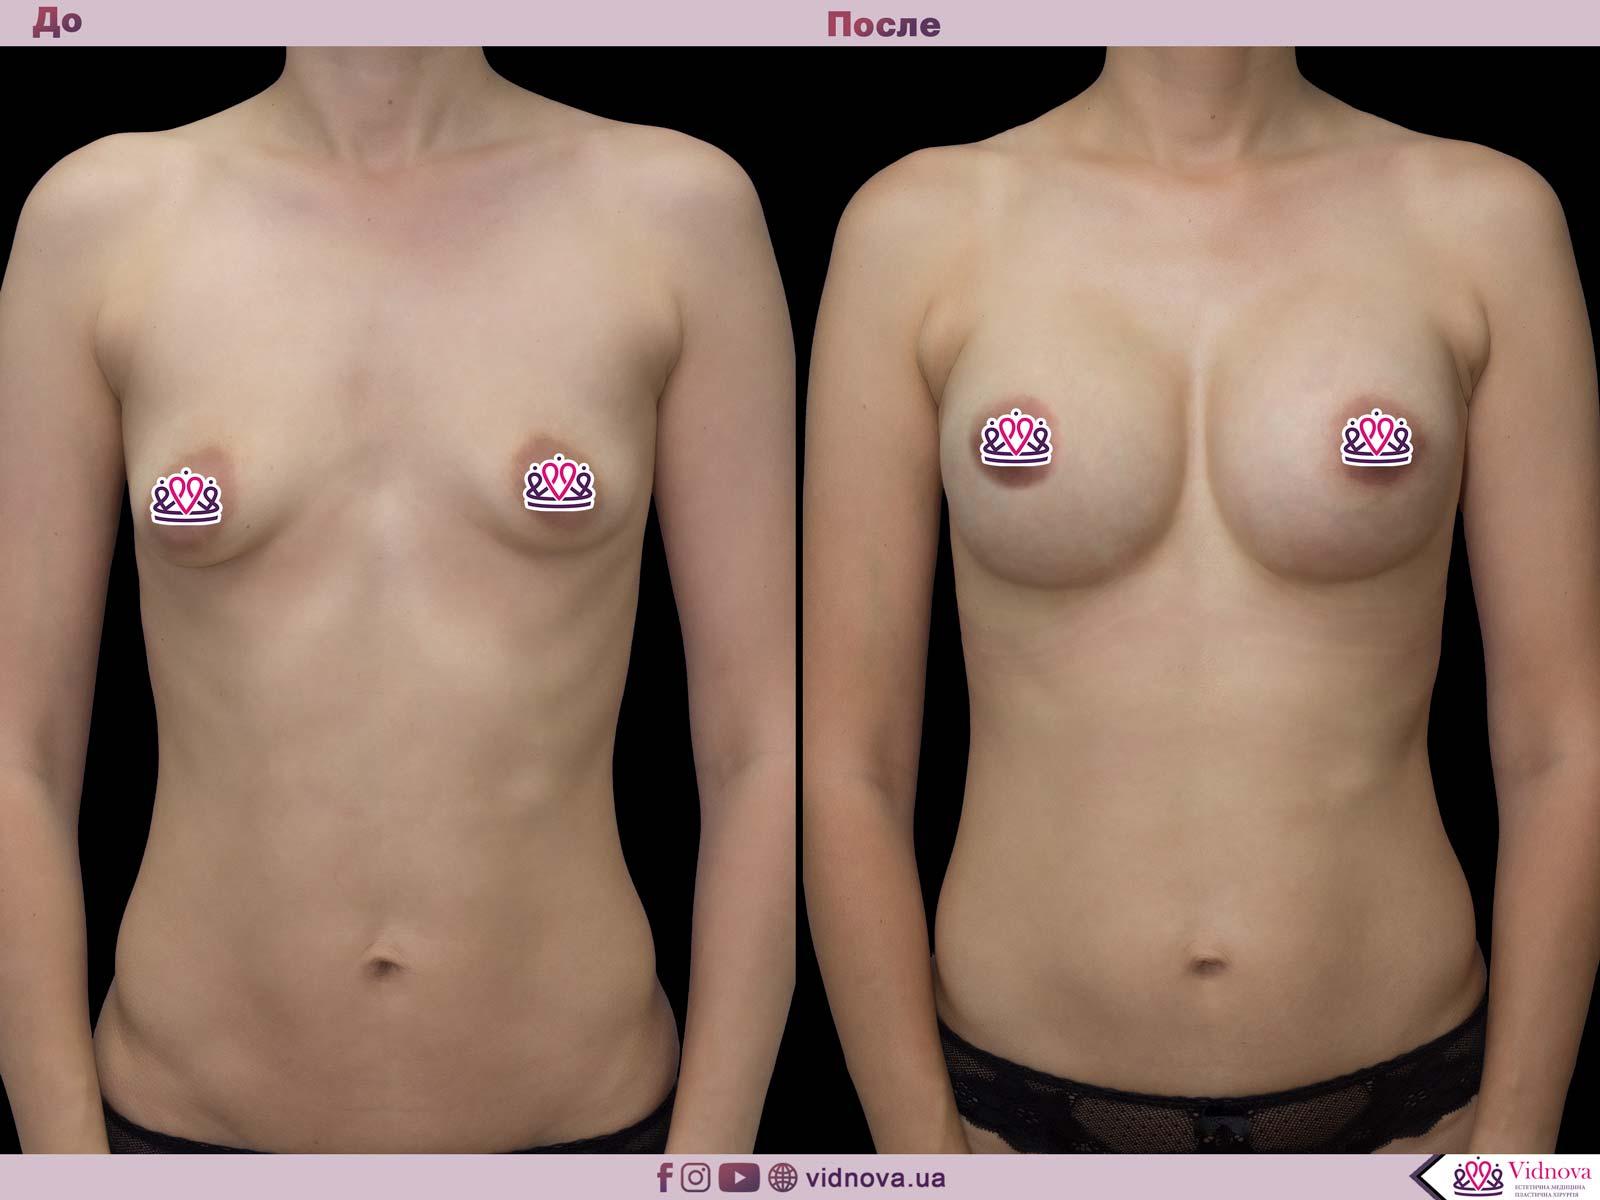 Коррекция асимметрии груди 1 7